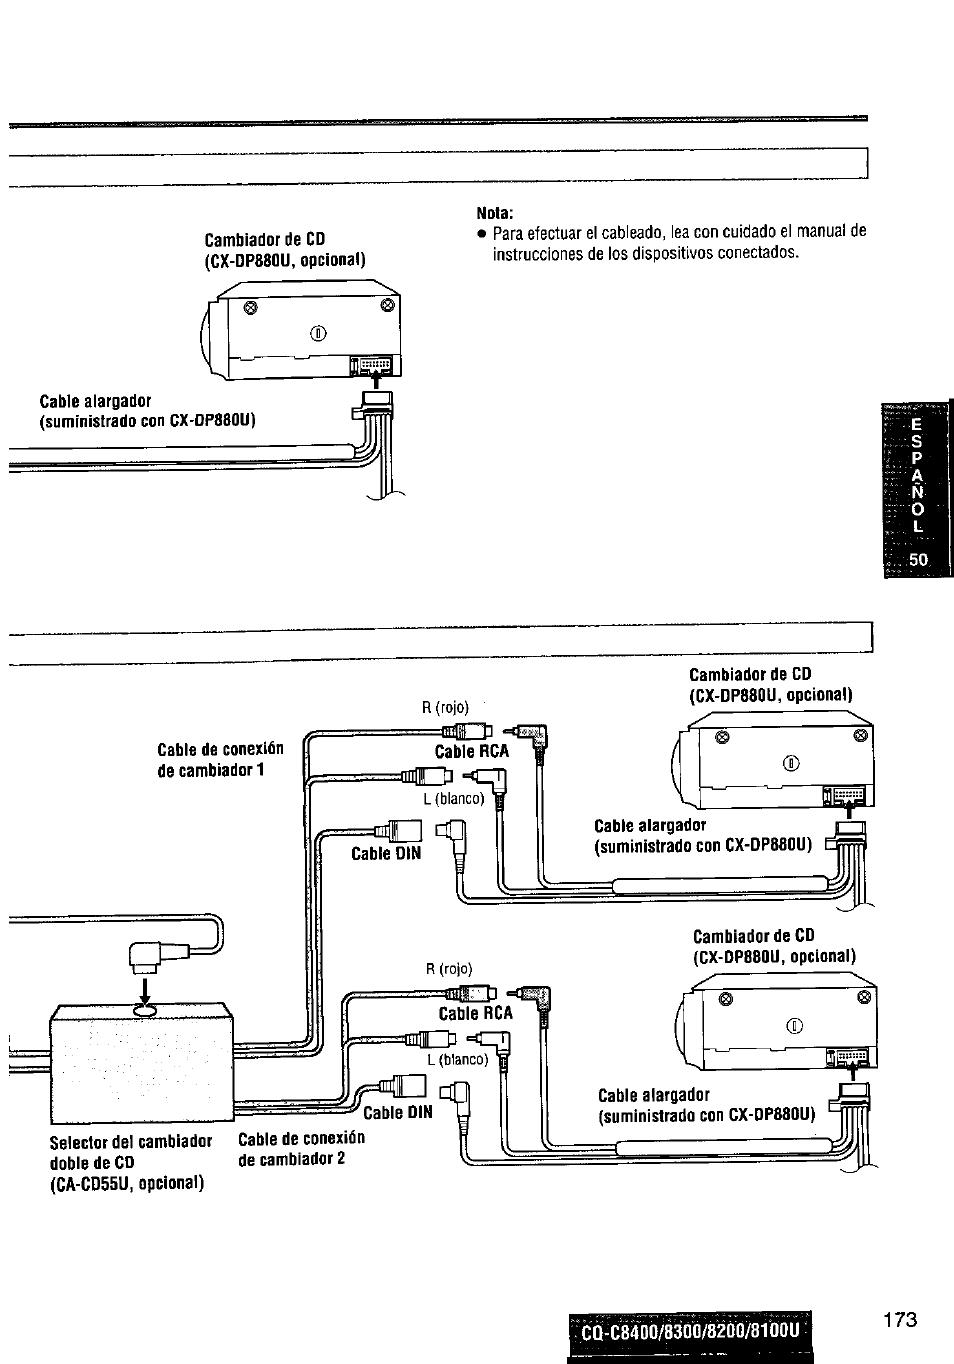 Panasonic Cq C8100u Wiring Diagram Online Schematics Car Stereo Also Cp134u C8300u User Manual Page 173 176 Original Mode